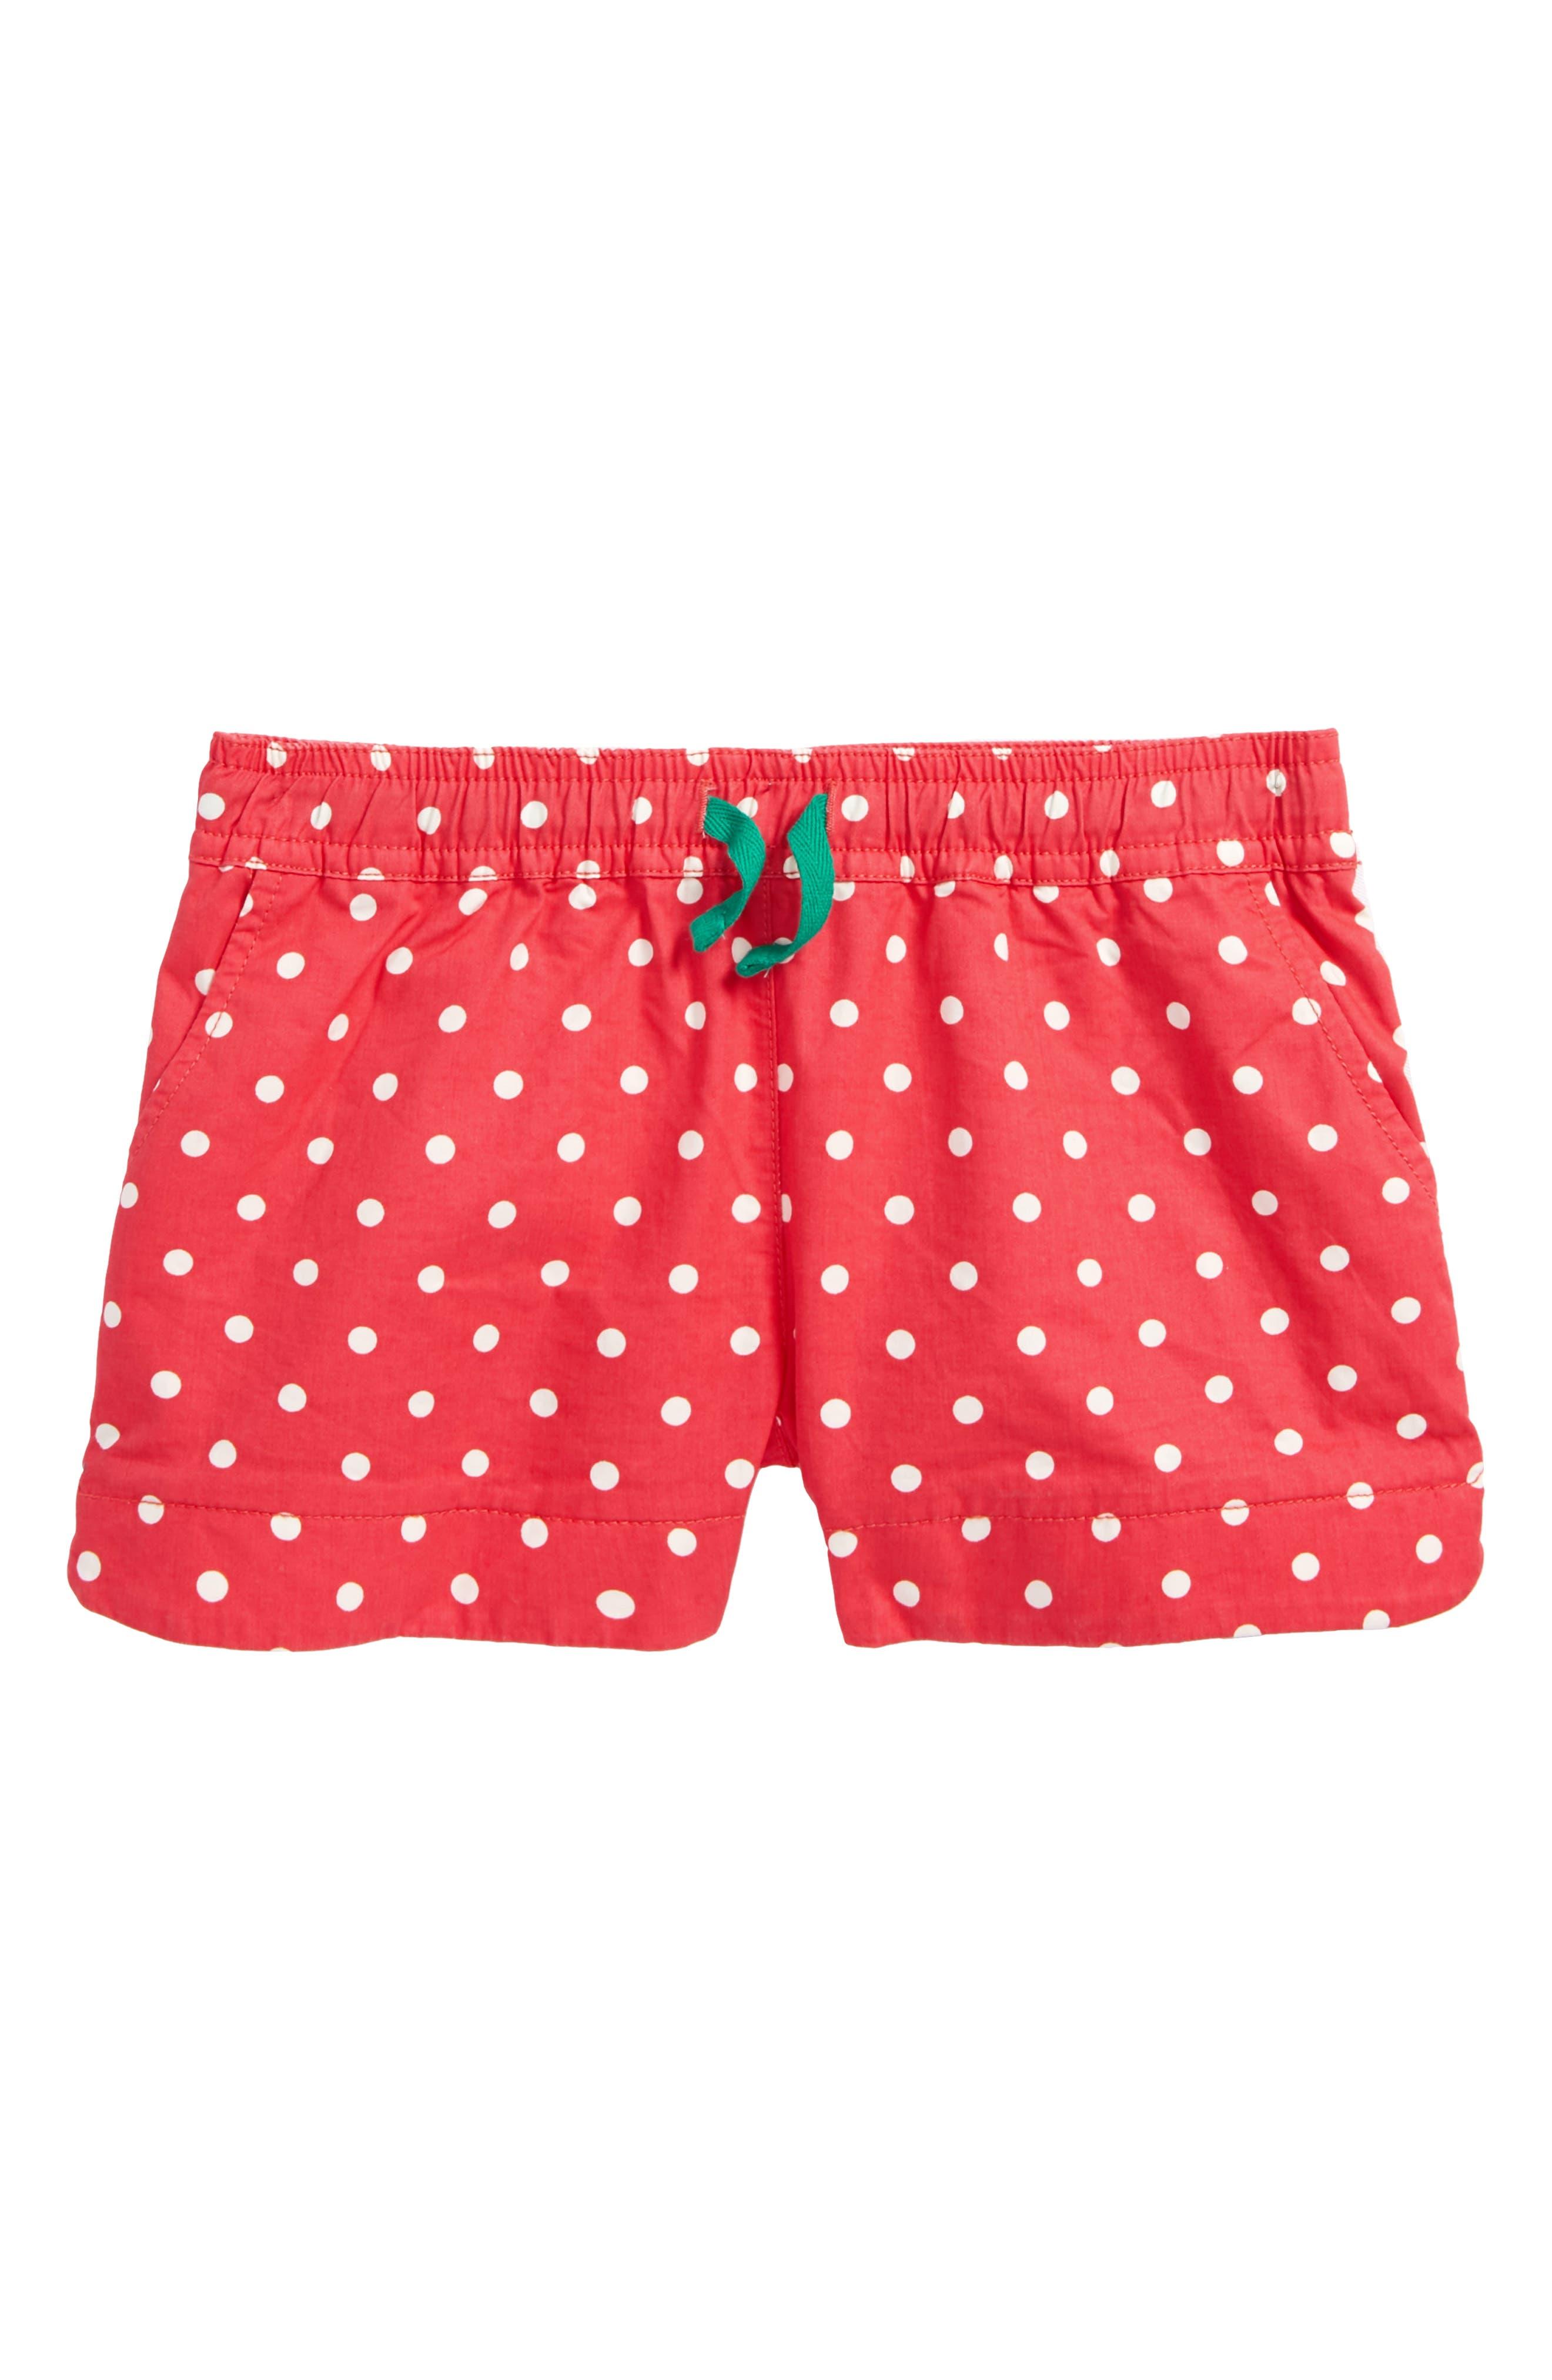 Heart Pocket Shorts,                         Main,                         color, Strawberry Split Pink Spot